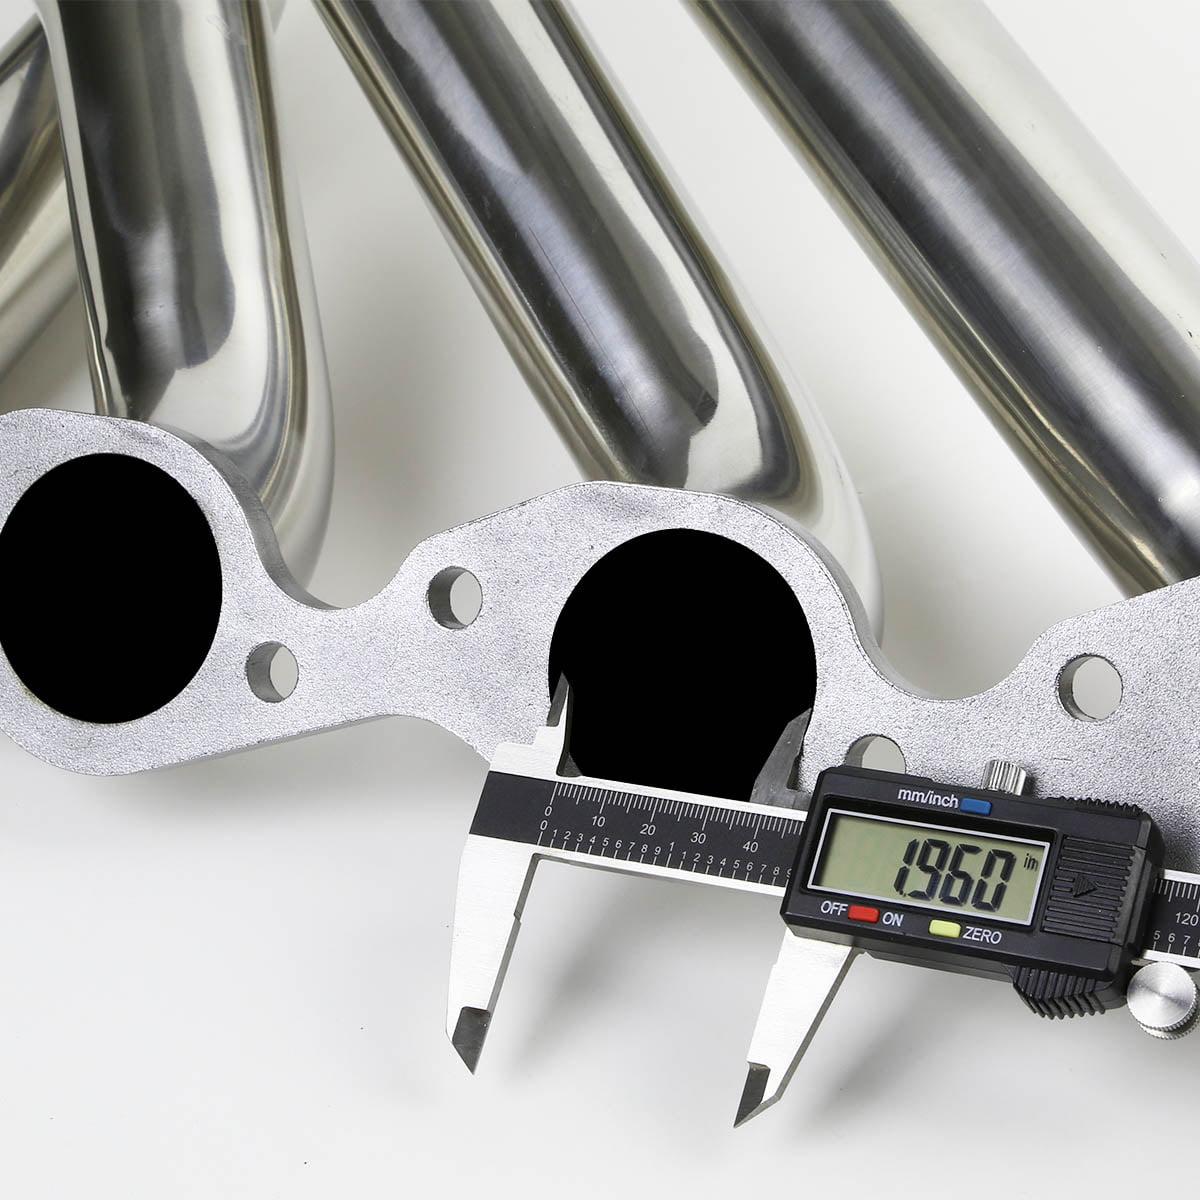 396 402 427 454 For Chevy Big Block Long Tube V8 4-1 Design 2-PC Stainless Steel Exhaust Header